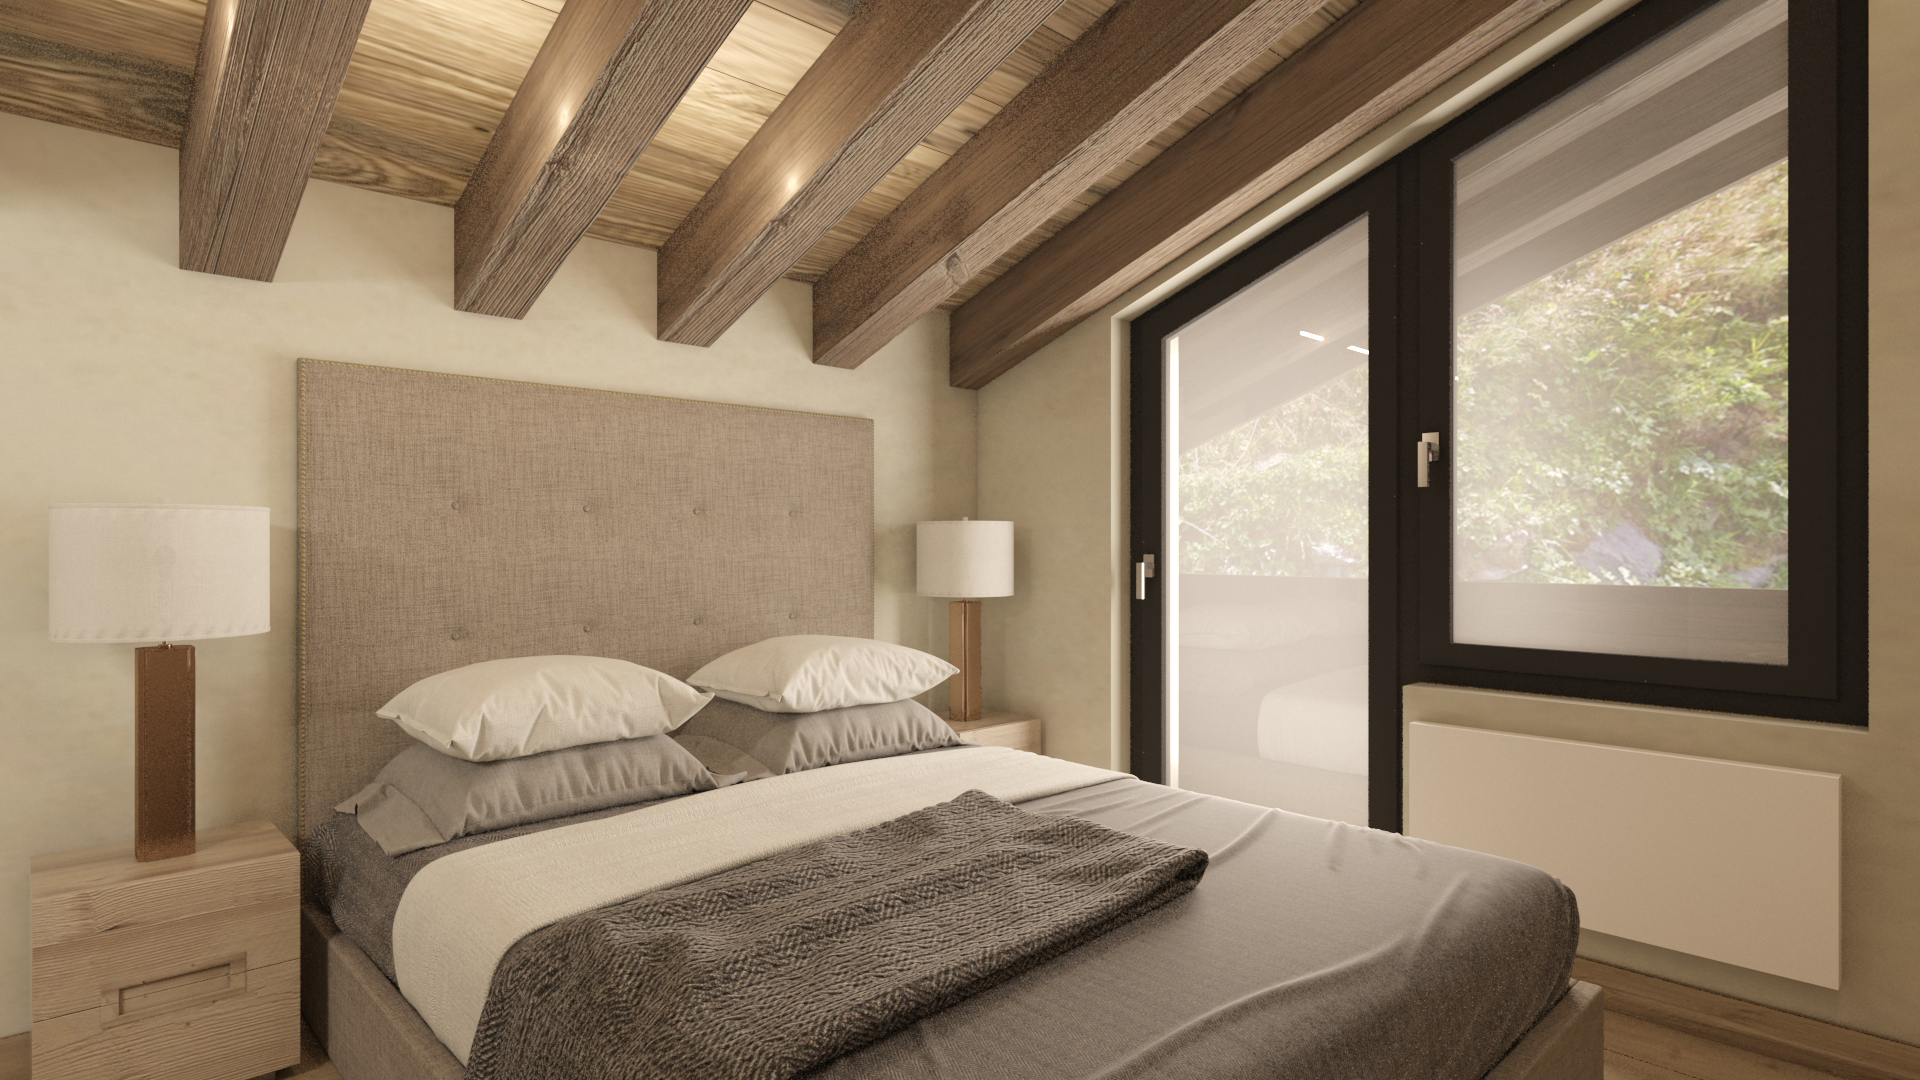 Twin Peak 1 Apartments, Switzerland